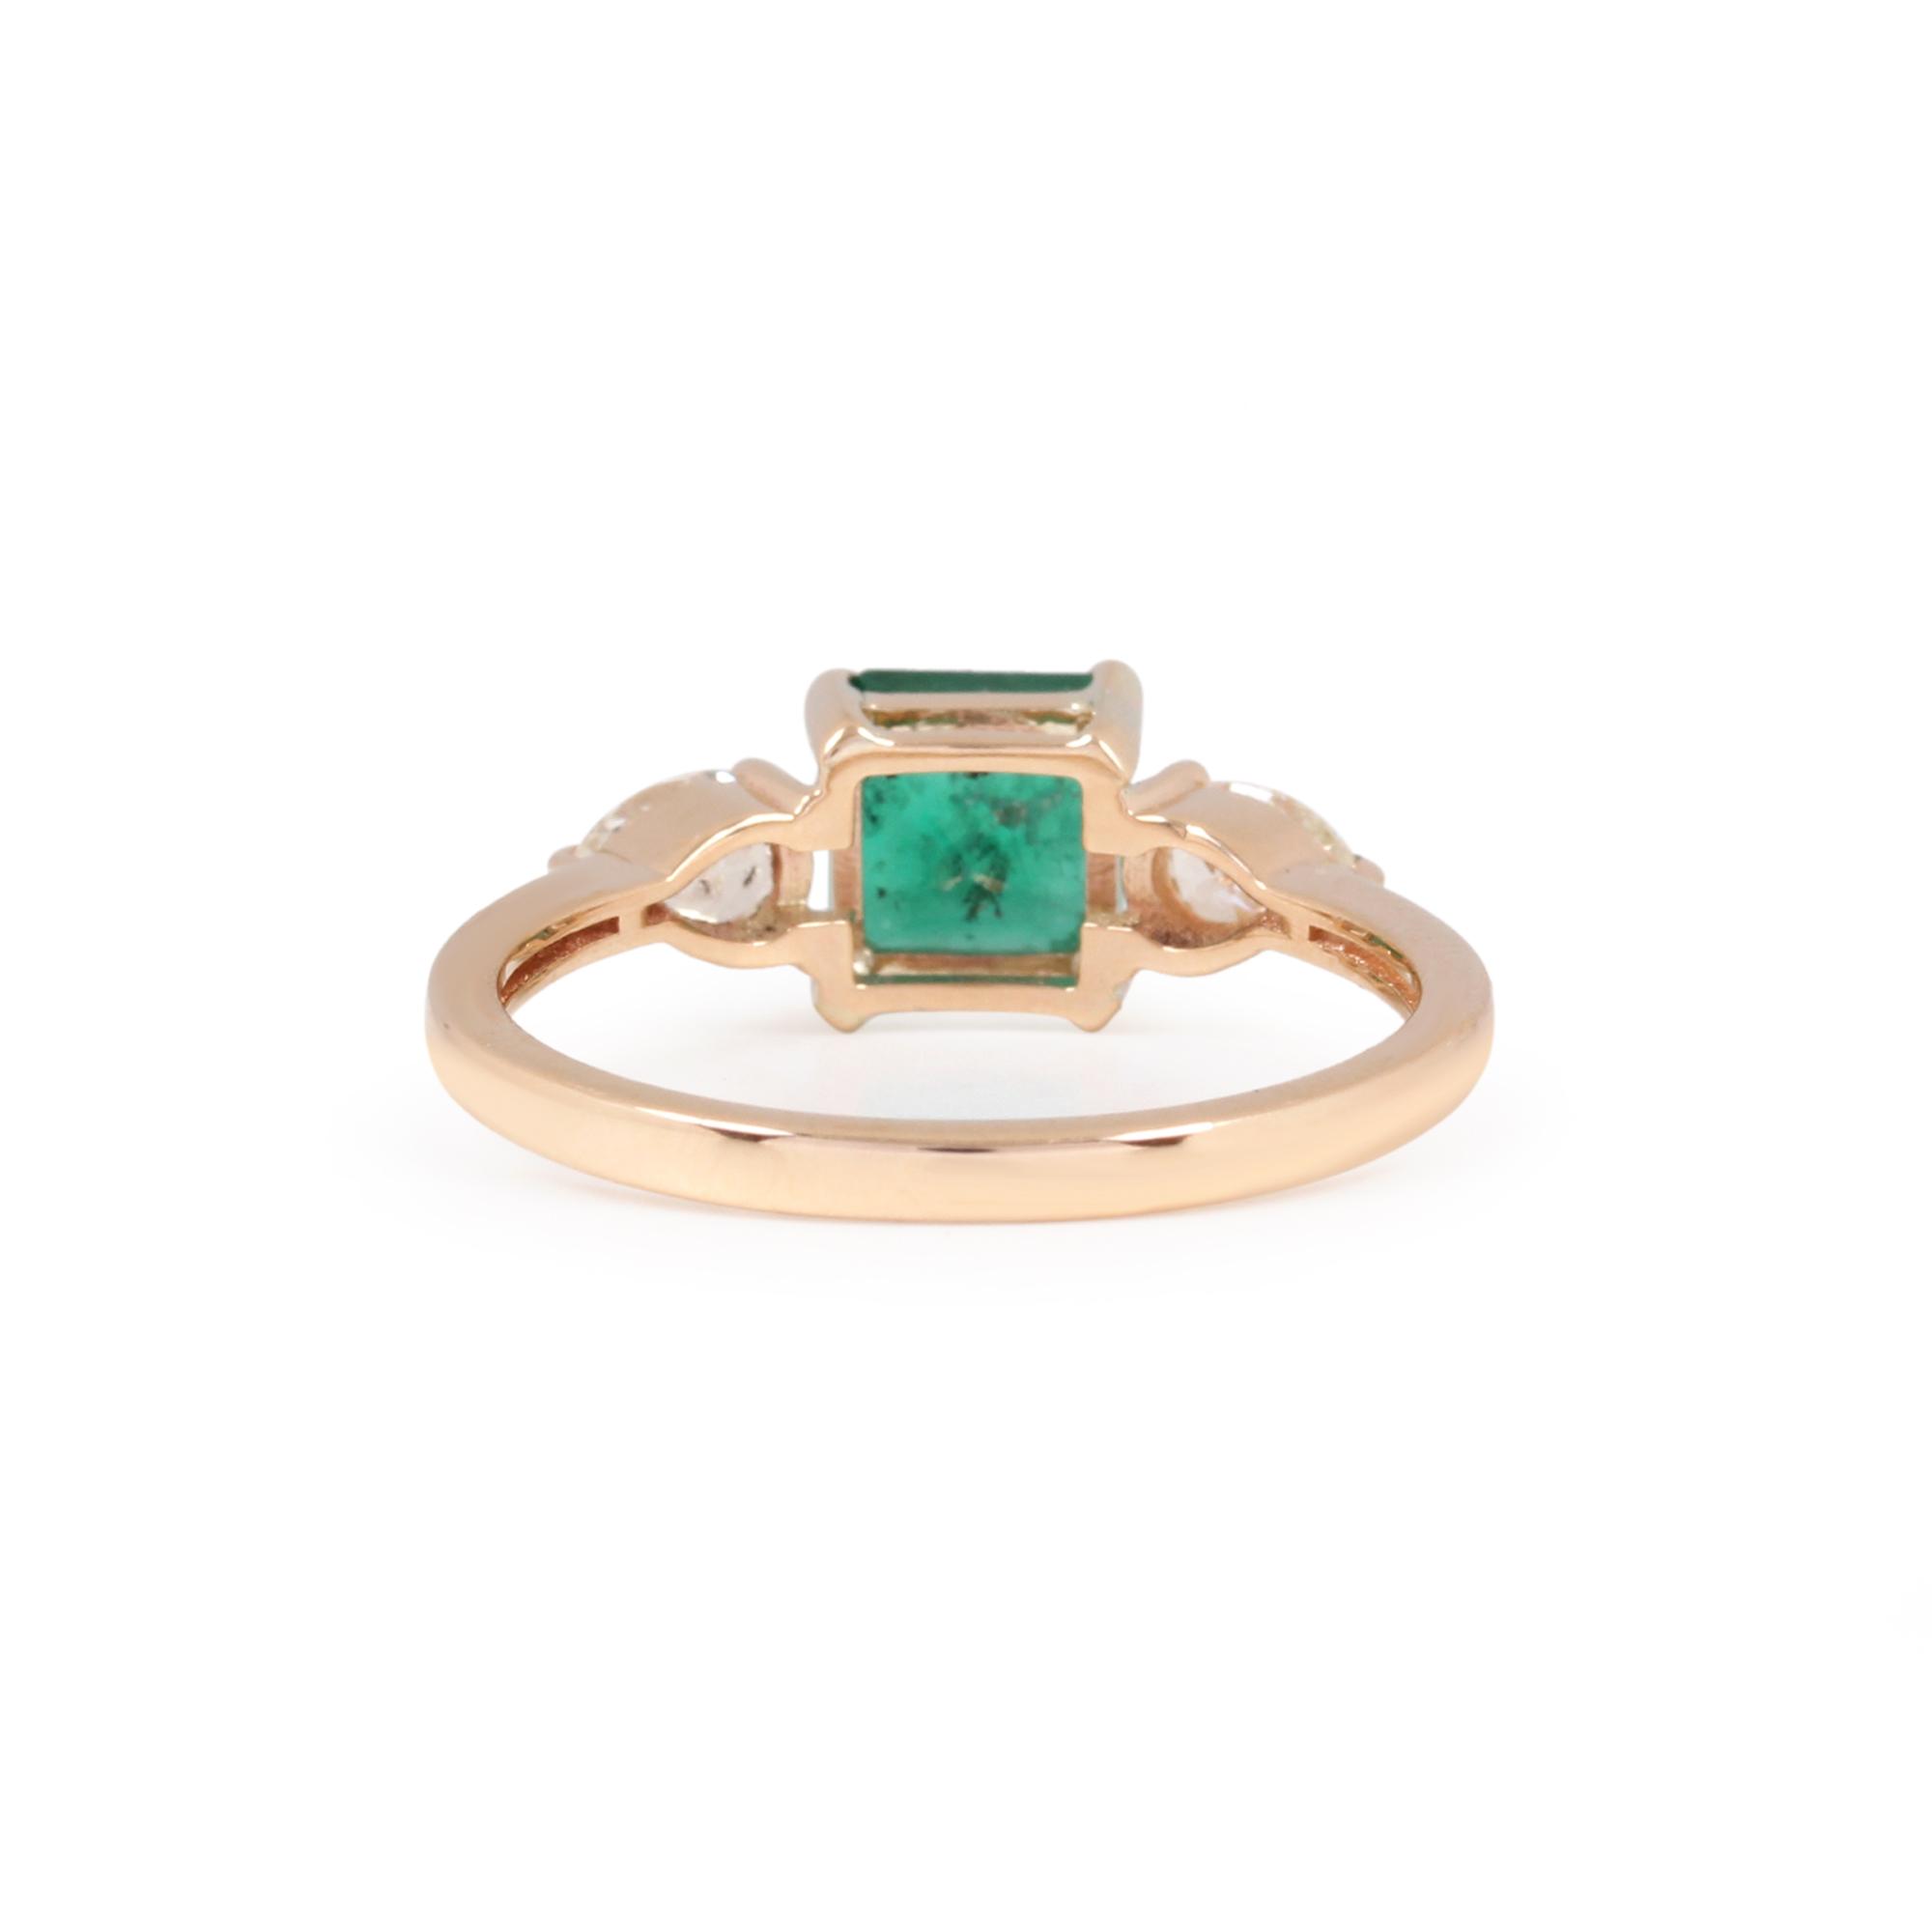 Natural Emerald Gemstone Diamond 14K Solid Gold Ring